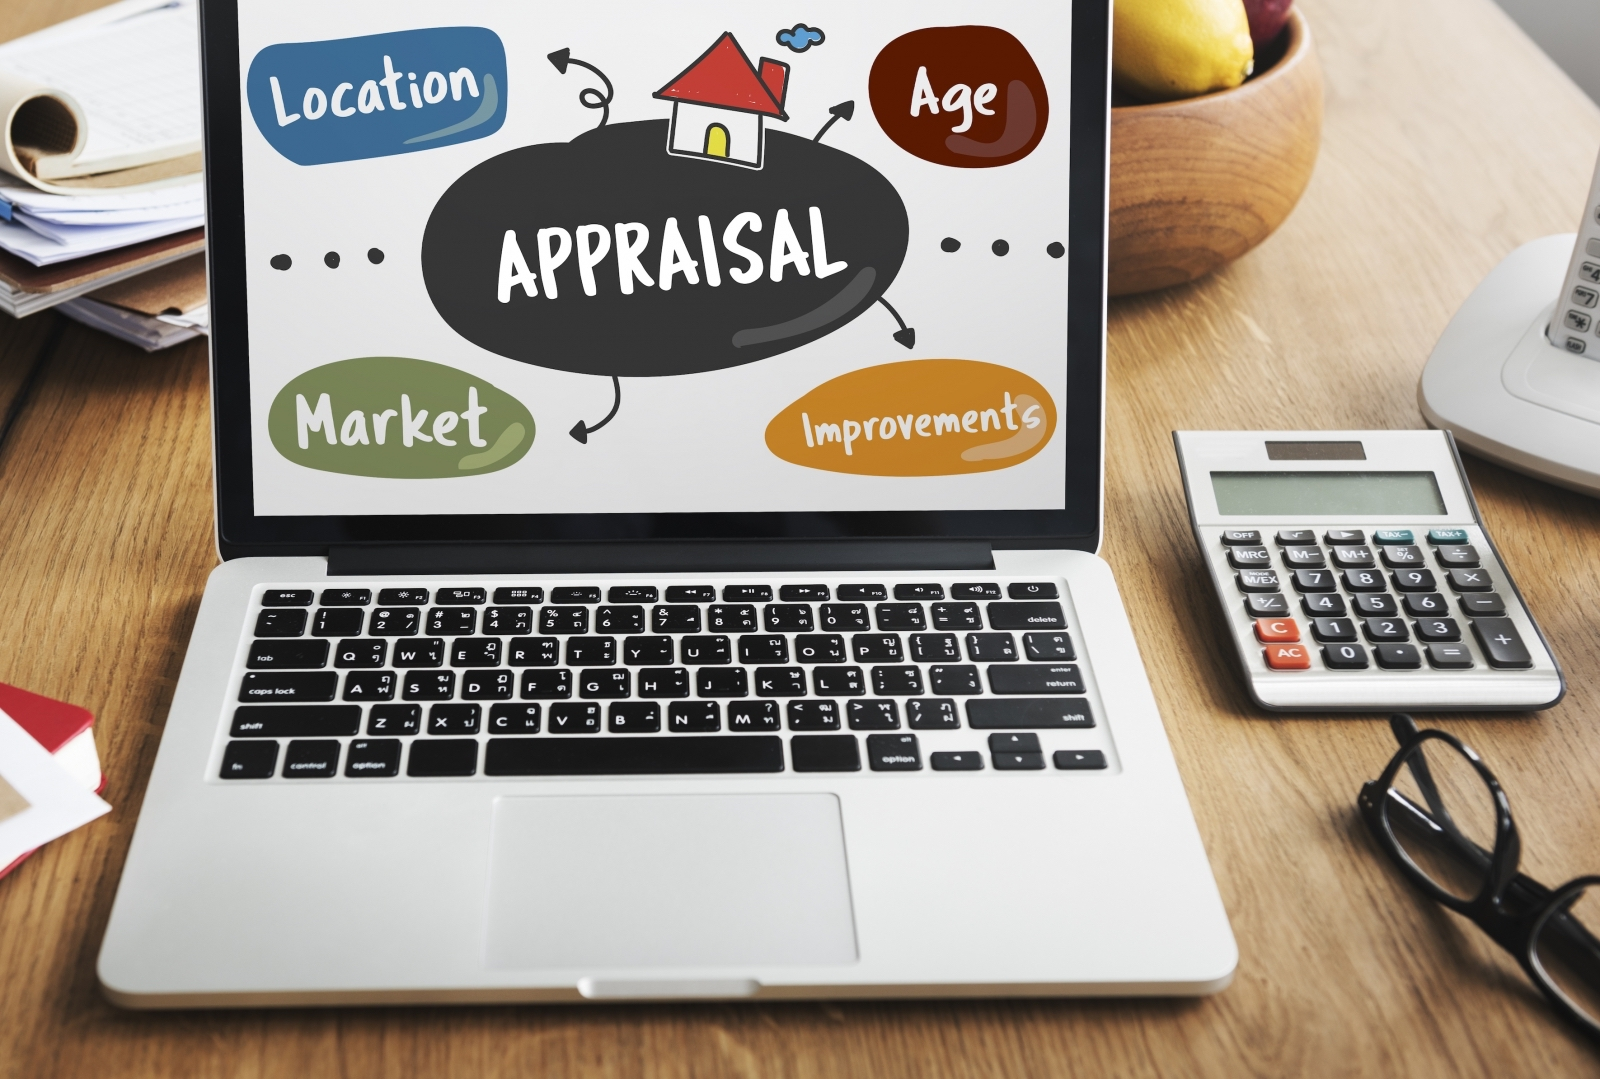 Remote Appraisal